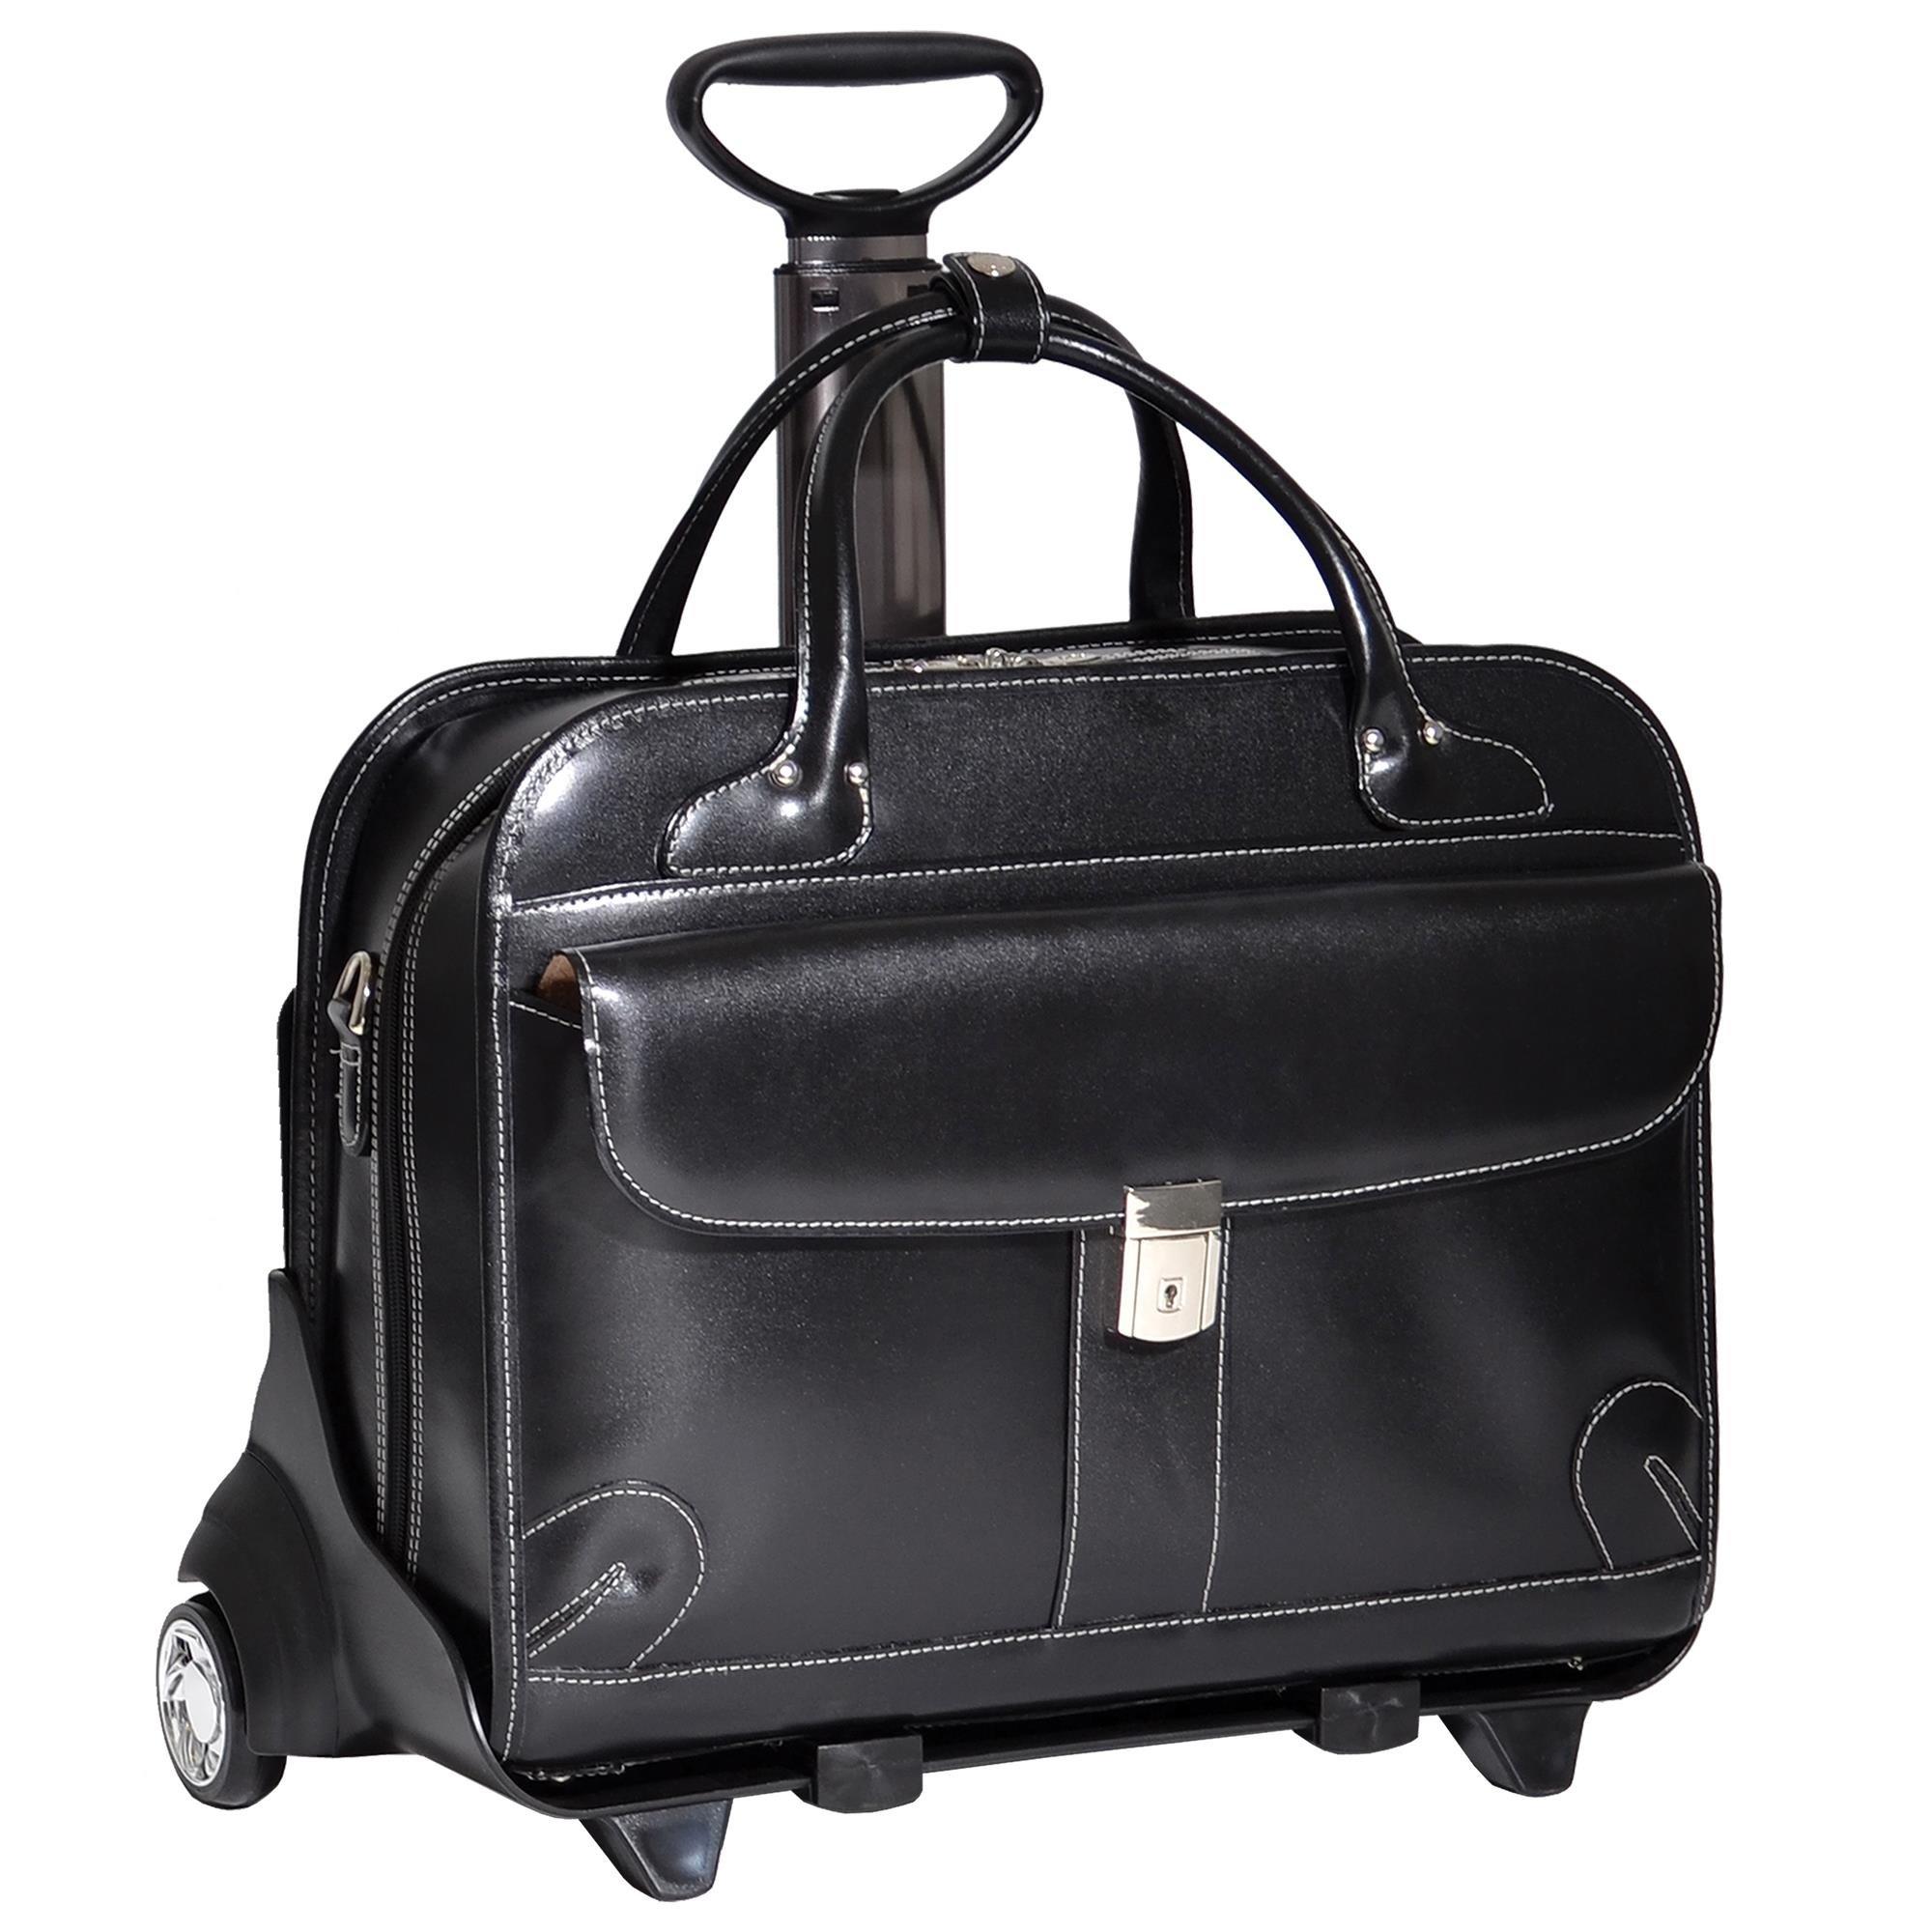 McKleinUSA LAKEWOOD 96615 Black Leather Fly-Through Checkpoint-Friendly Detachable-Wheeled Ladies' Briefcase by McKleinUSA (Image #9)